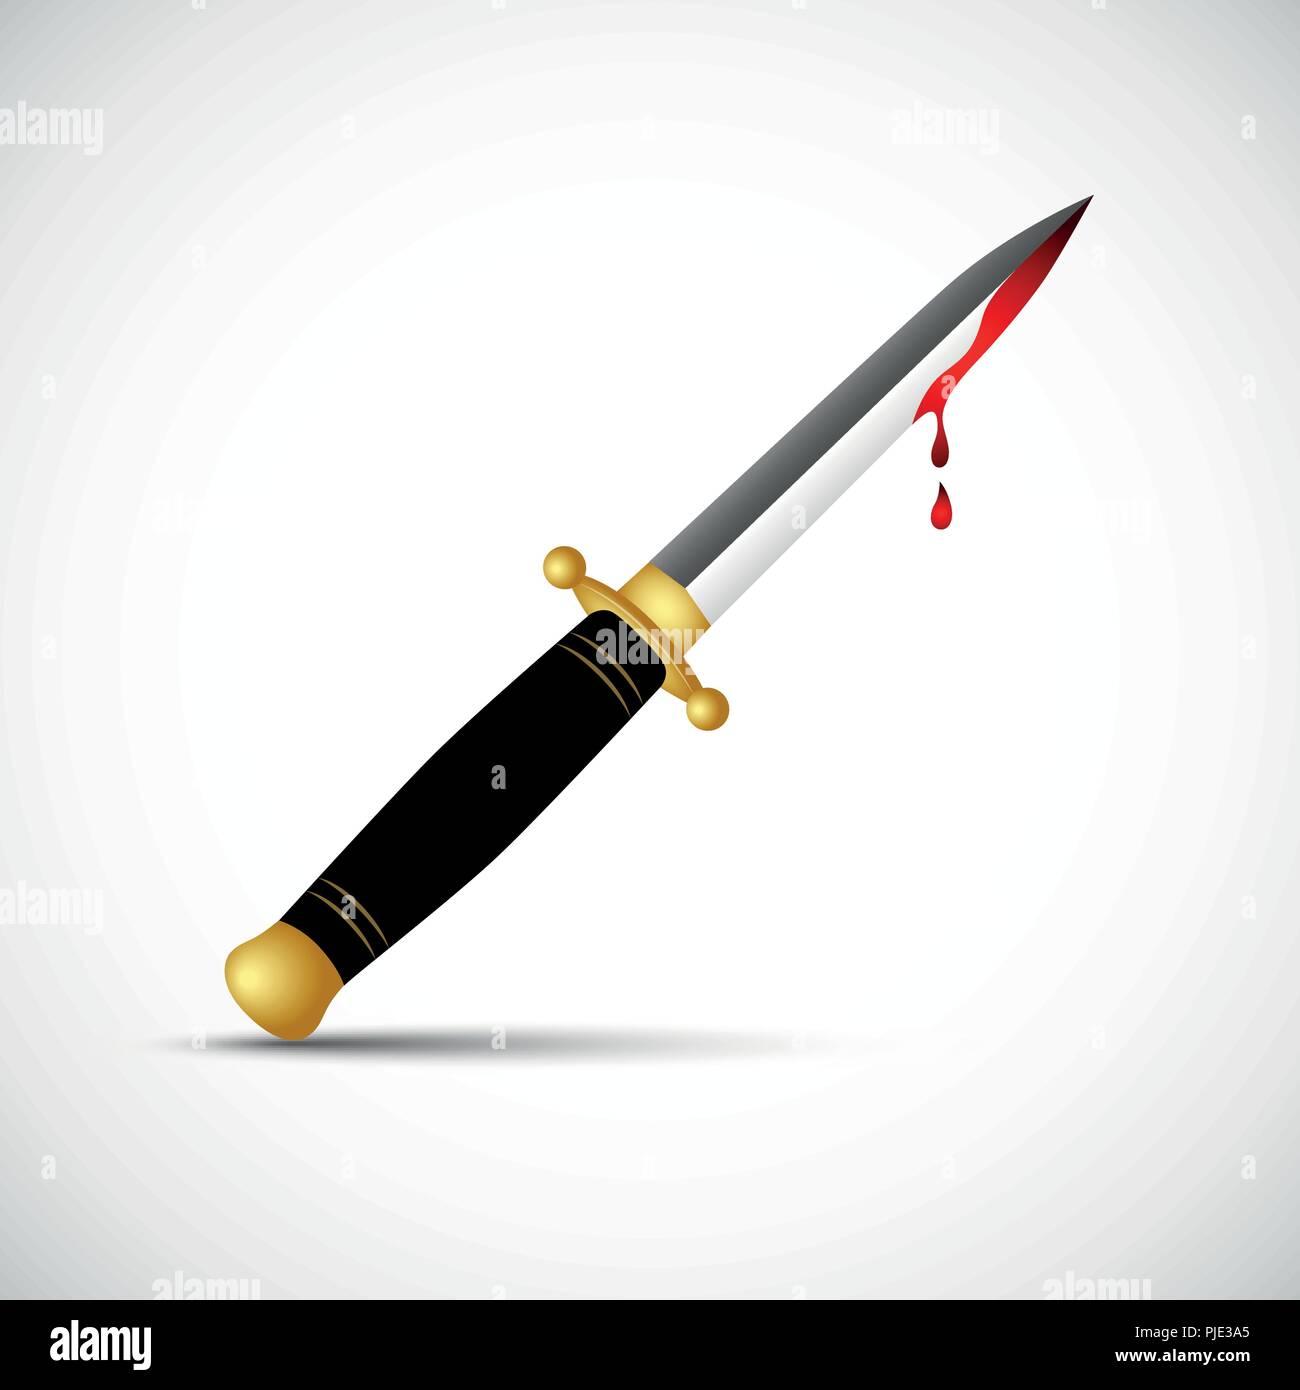 sharp bloody dagger knife isolated vector illustration EPS10 - Stock Vector